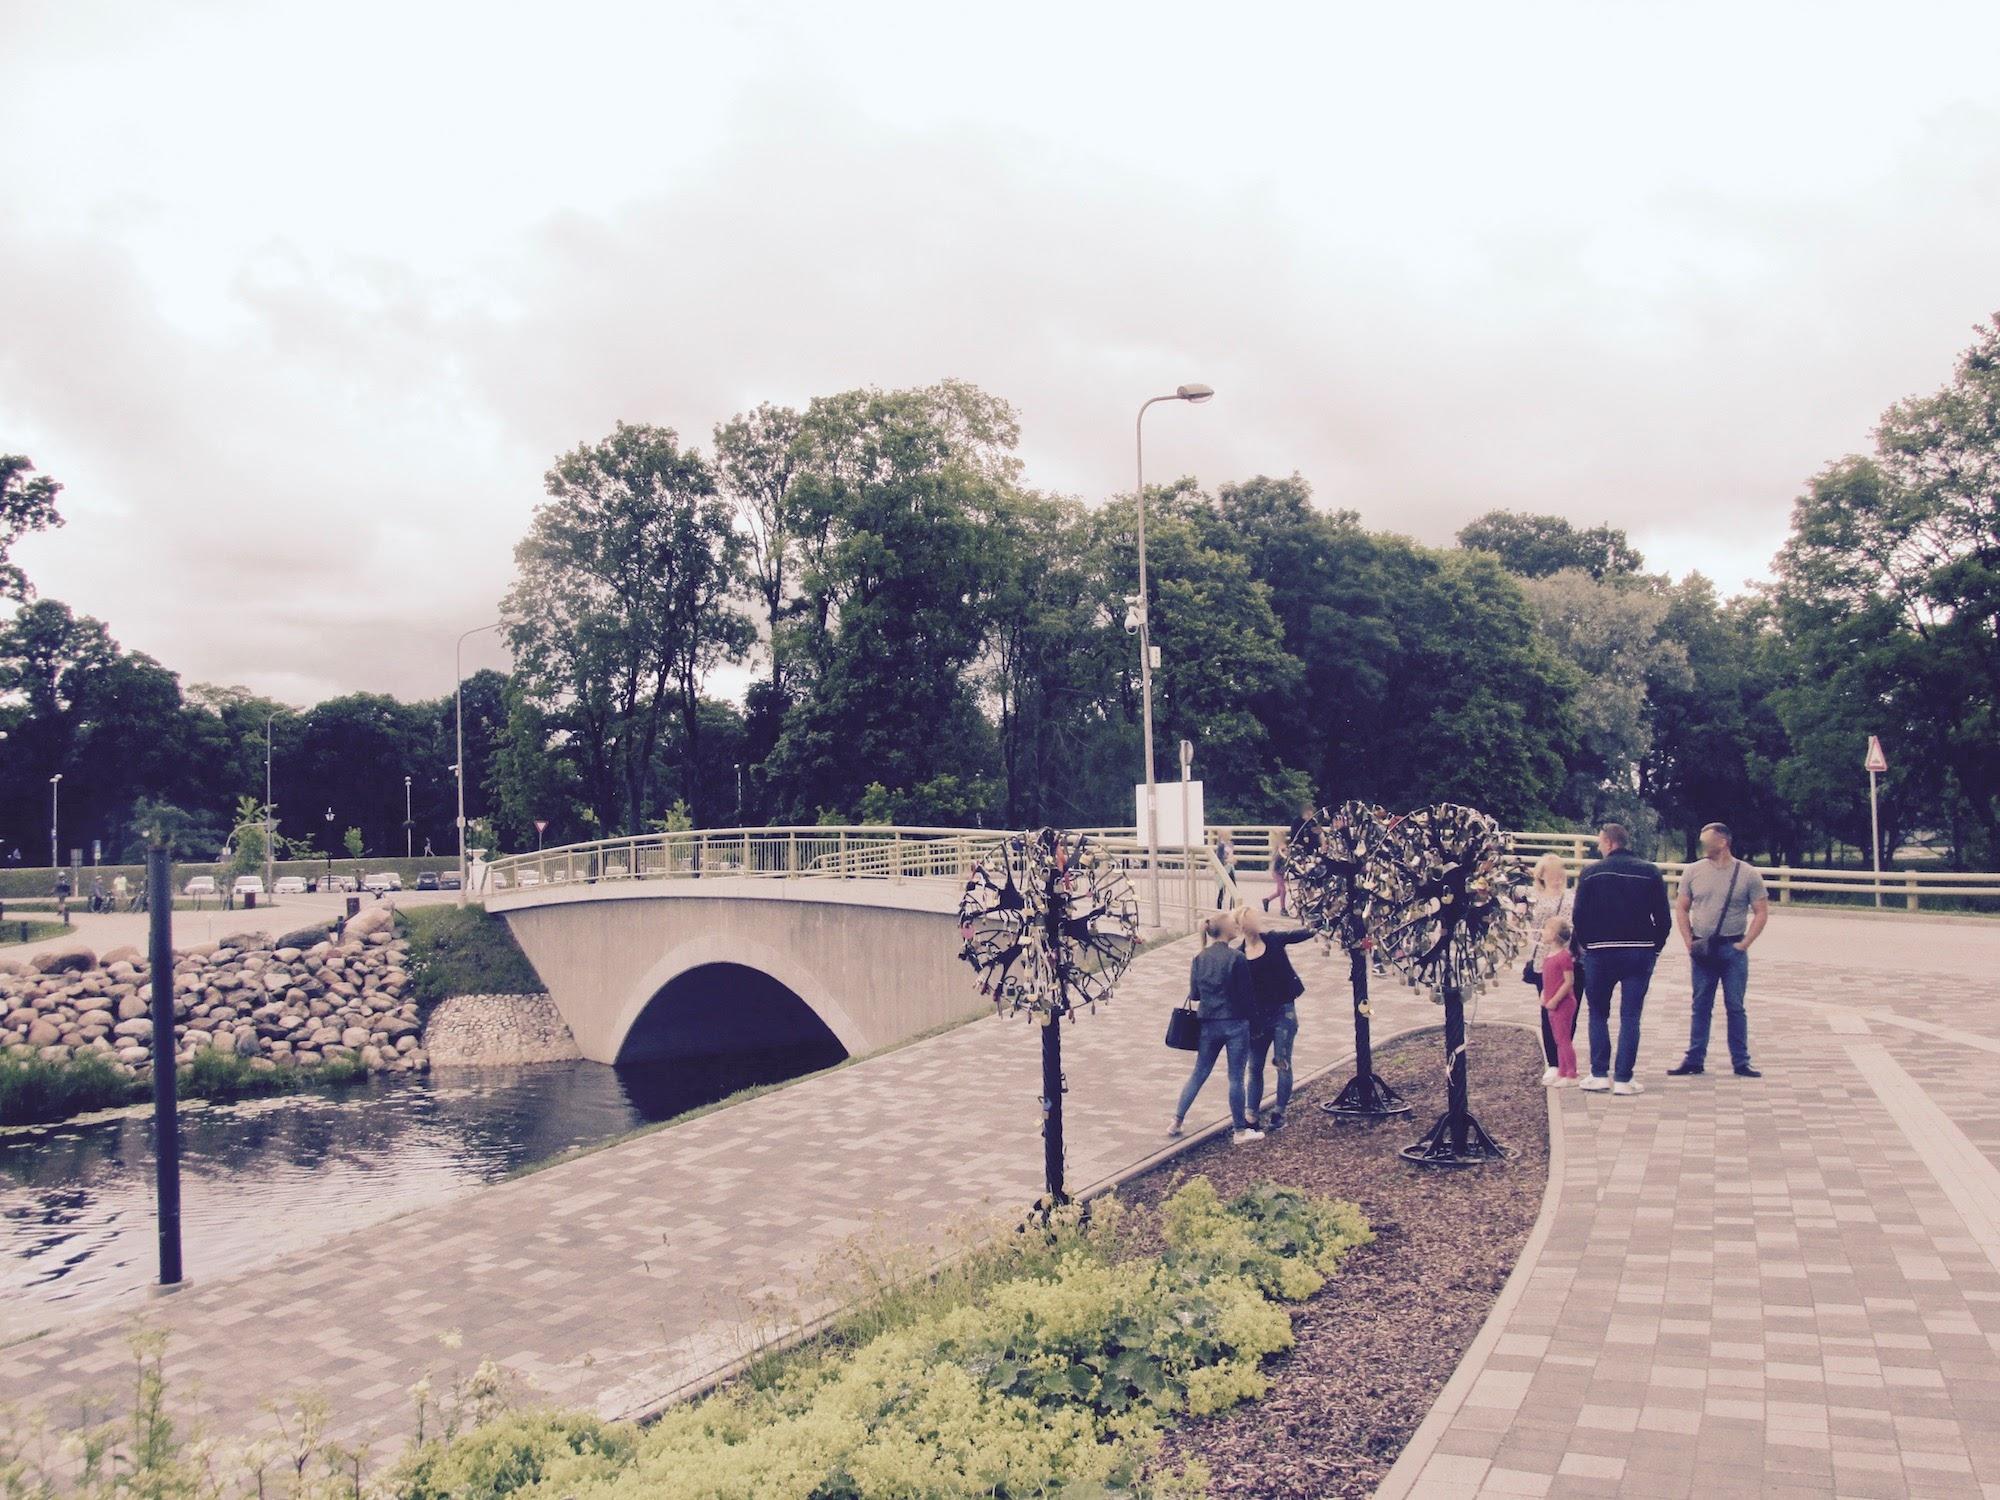 People enjoying summer in Jelgava - Urban Treetops